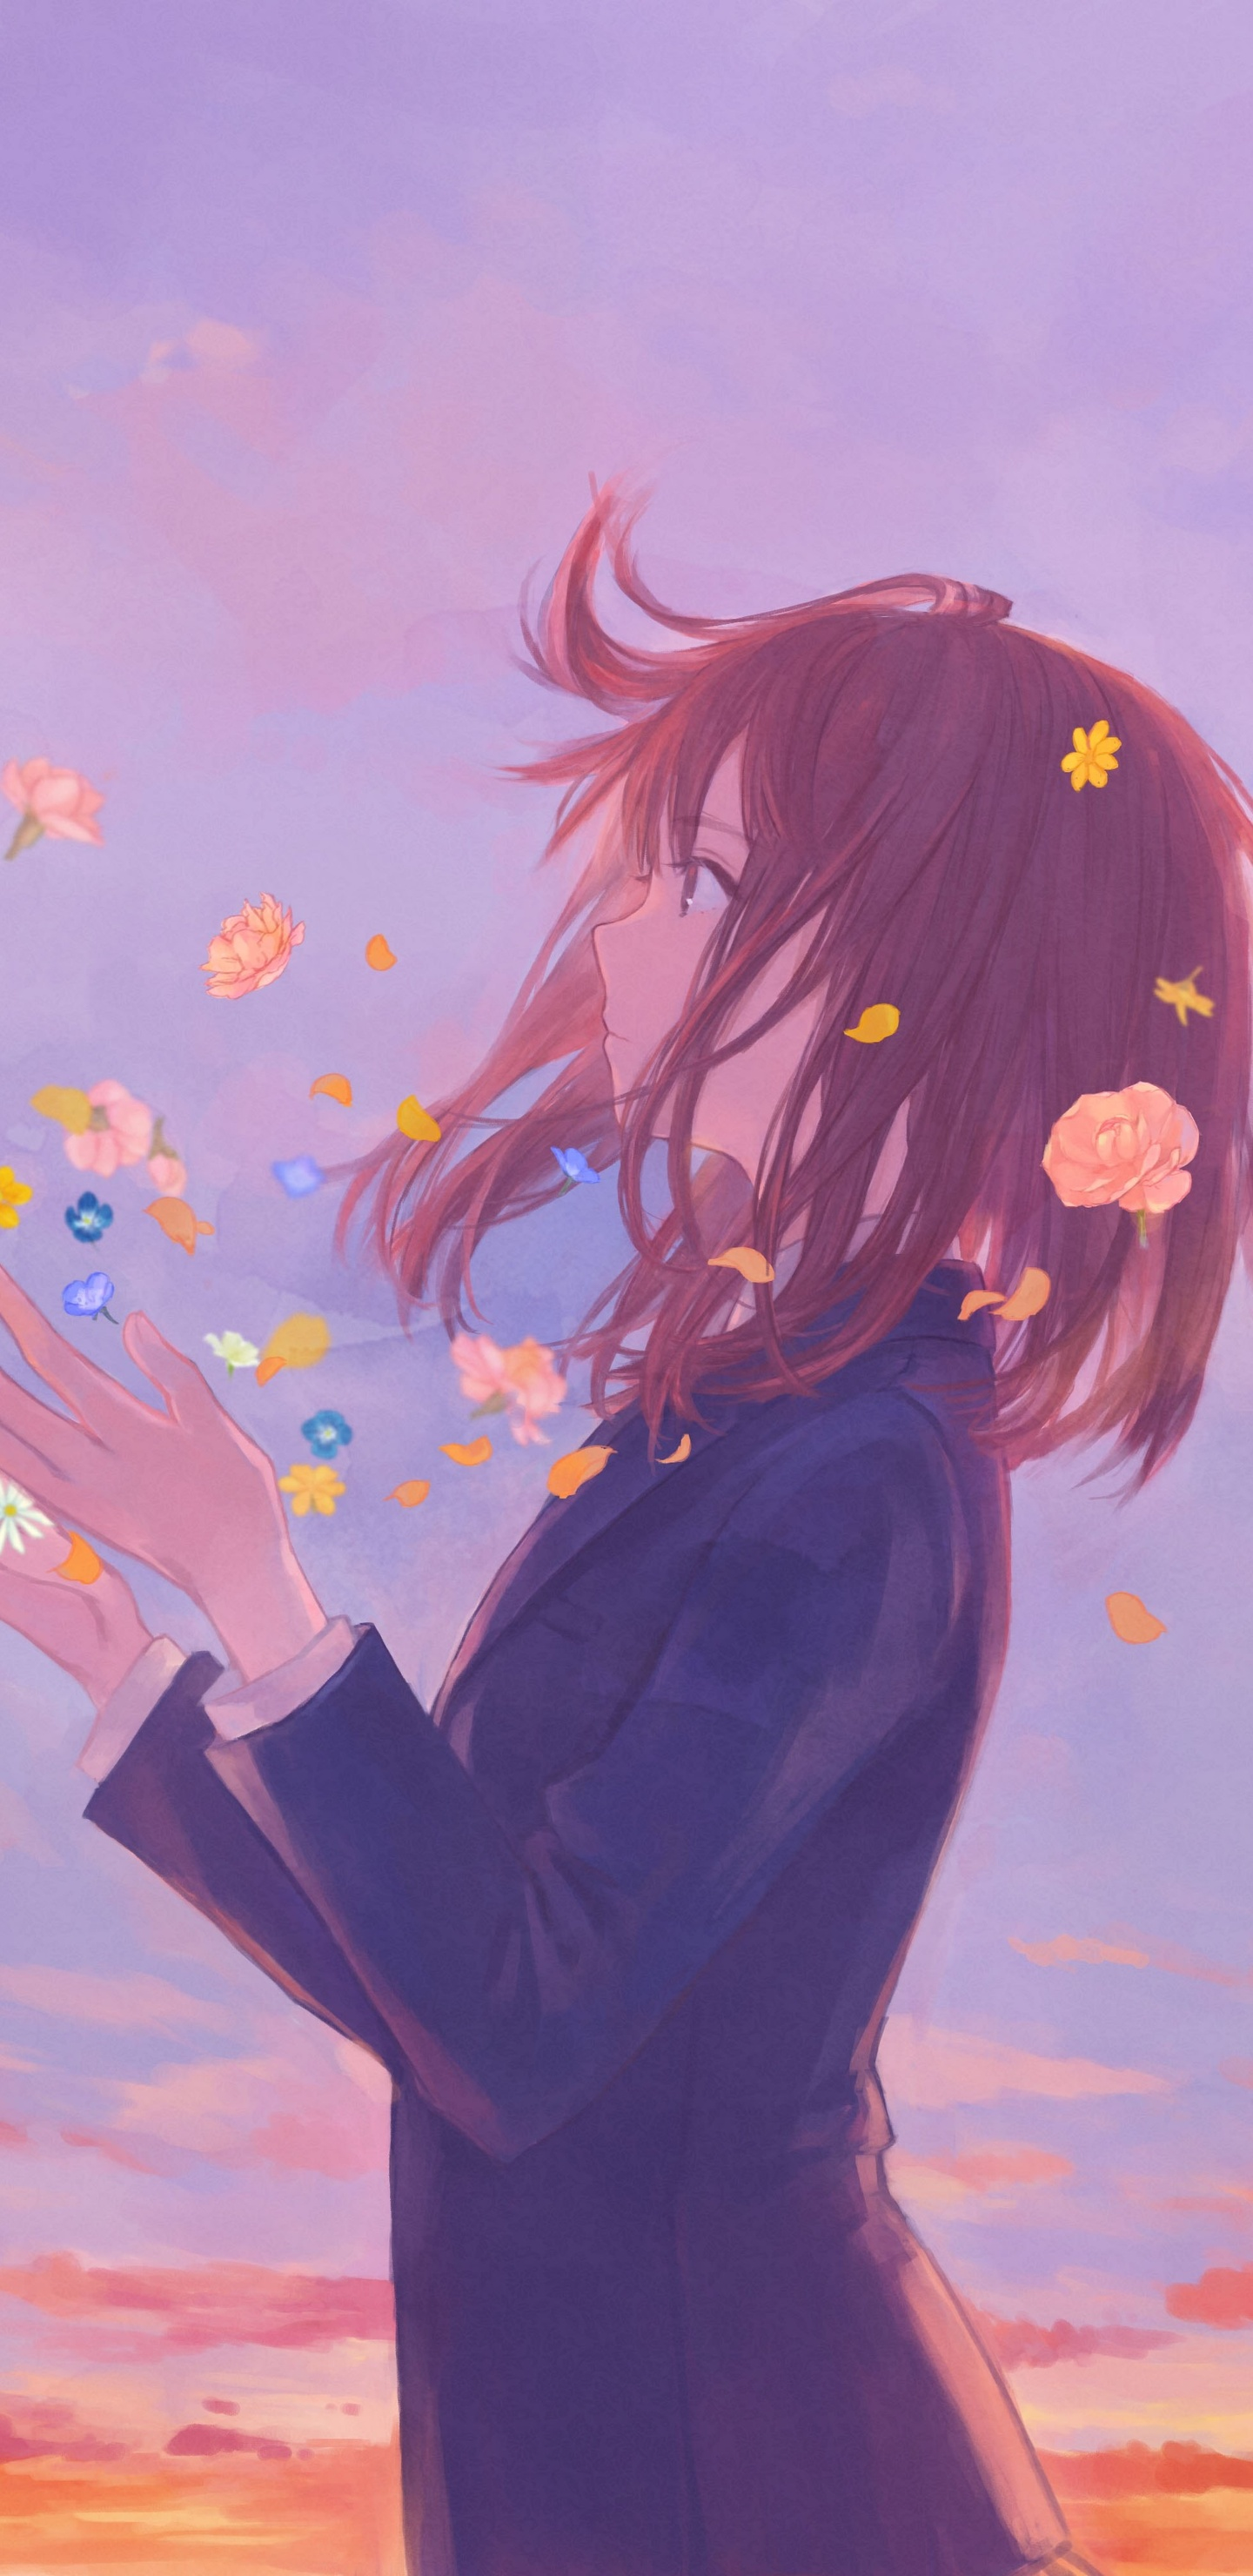 1440x2960 anime girl school uniform flowers clouds 8k samsung galaxy